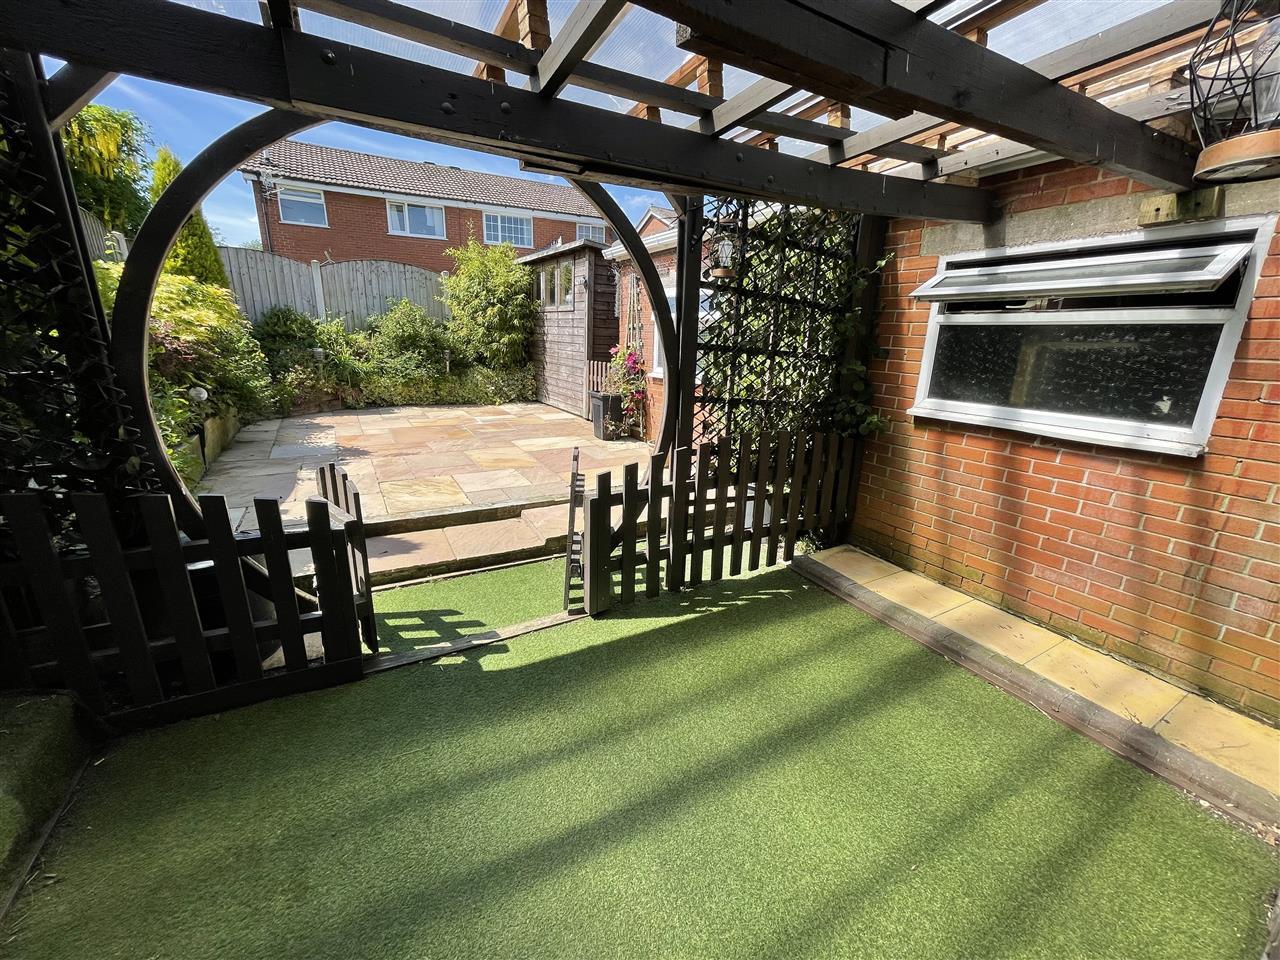 3 bed semi-detached for sale in Balmoral, Adlington, Adlington 11